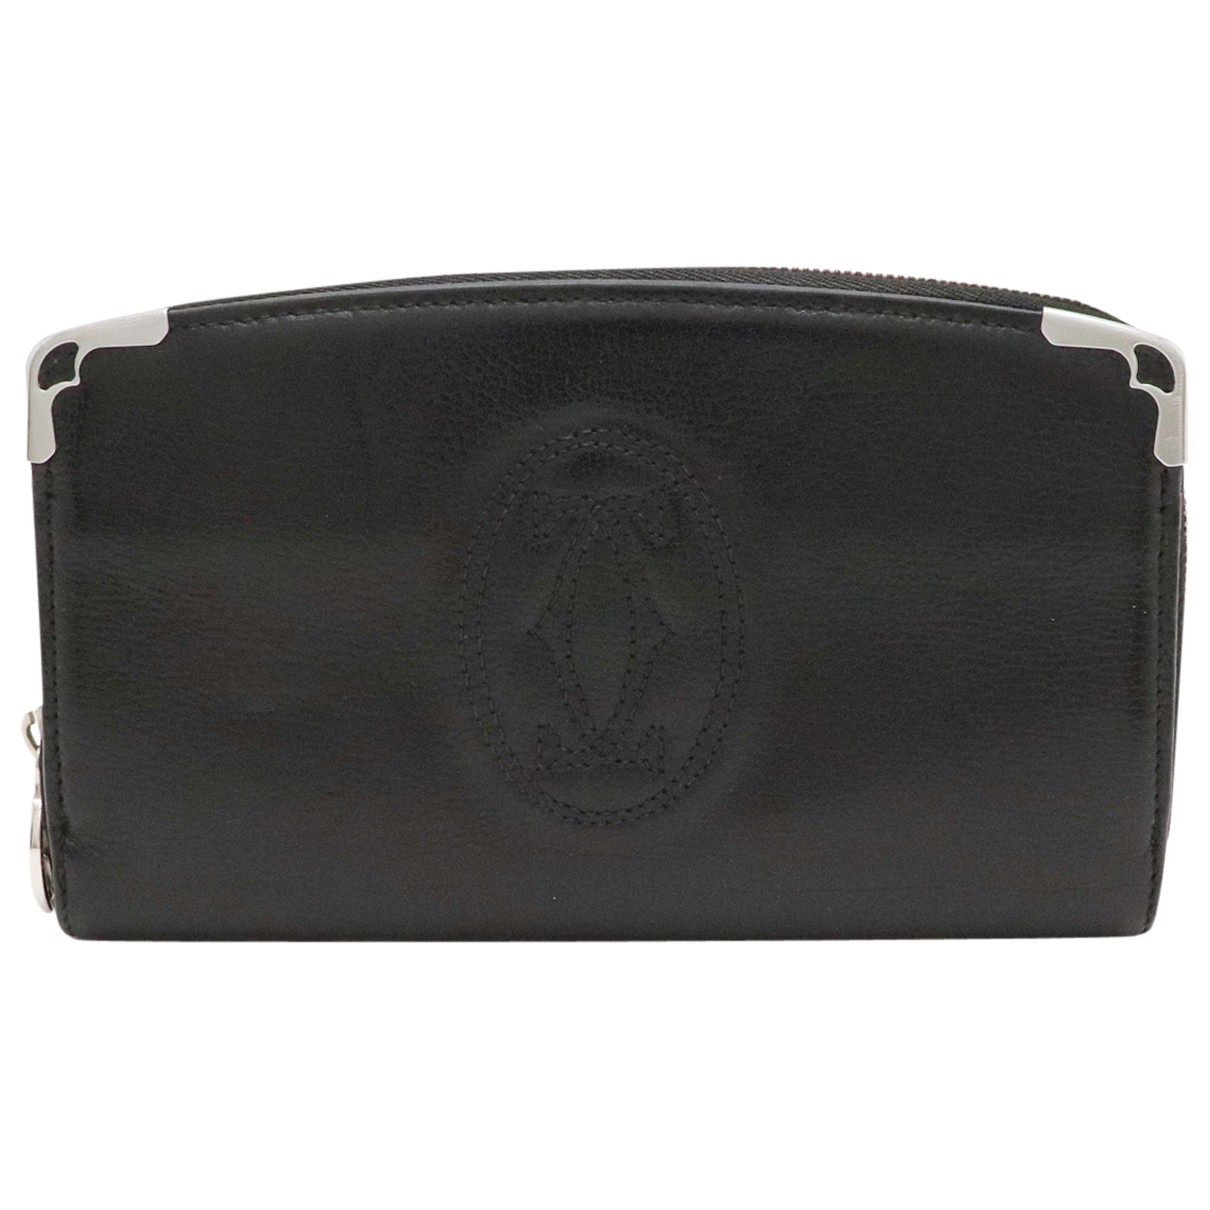 Cartier \N Black Leather wallet for Women \N